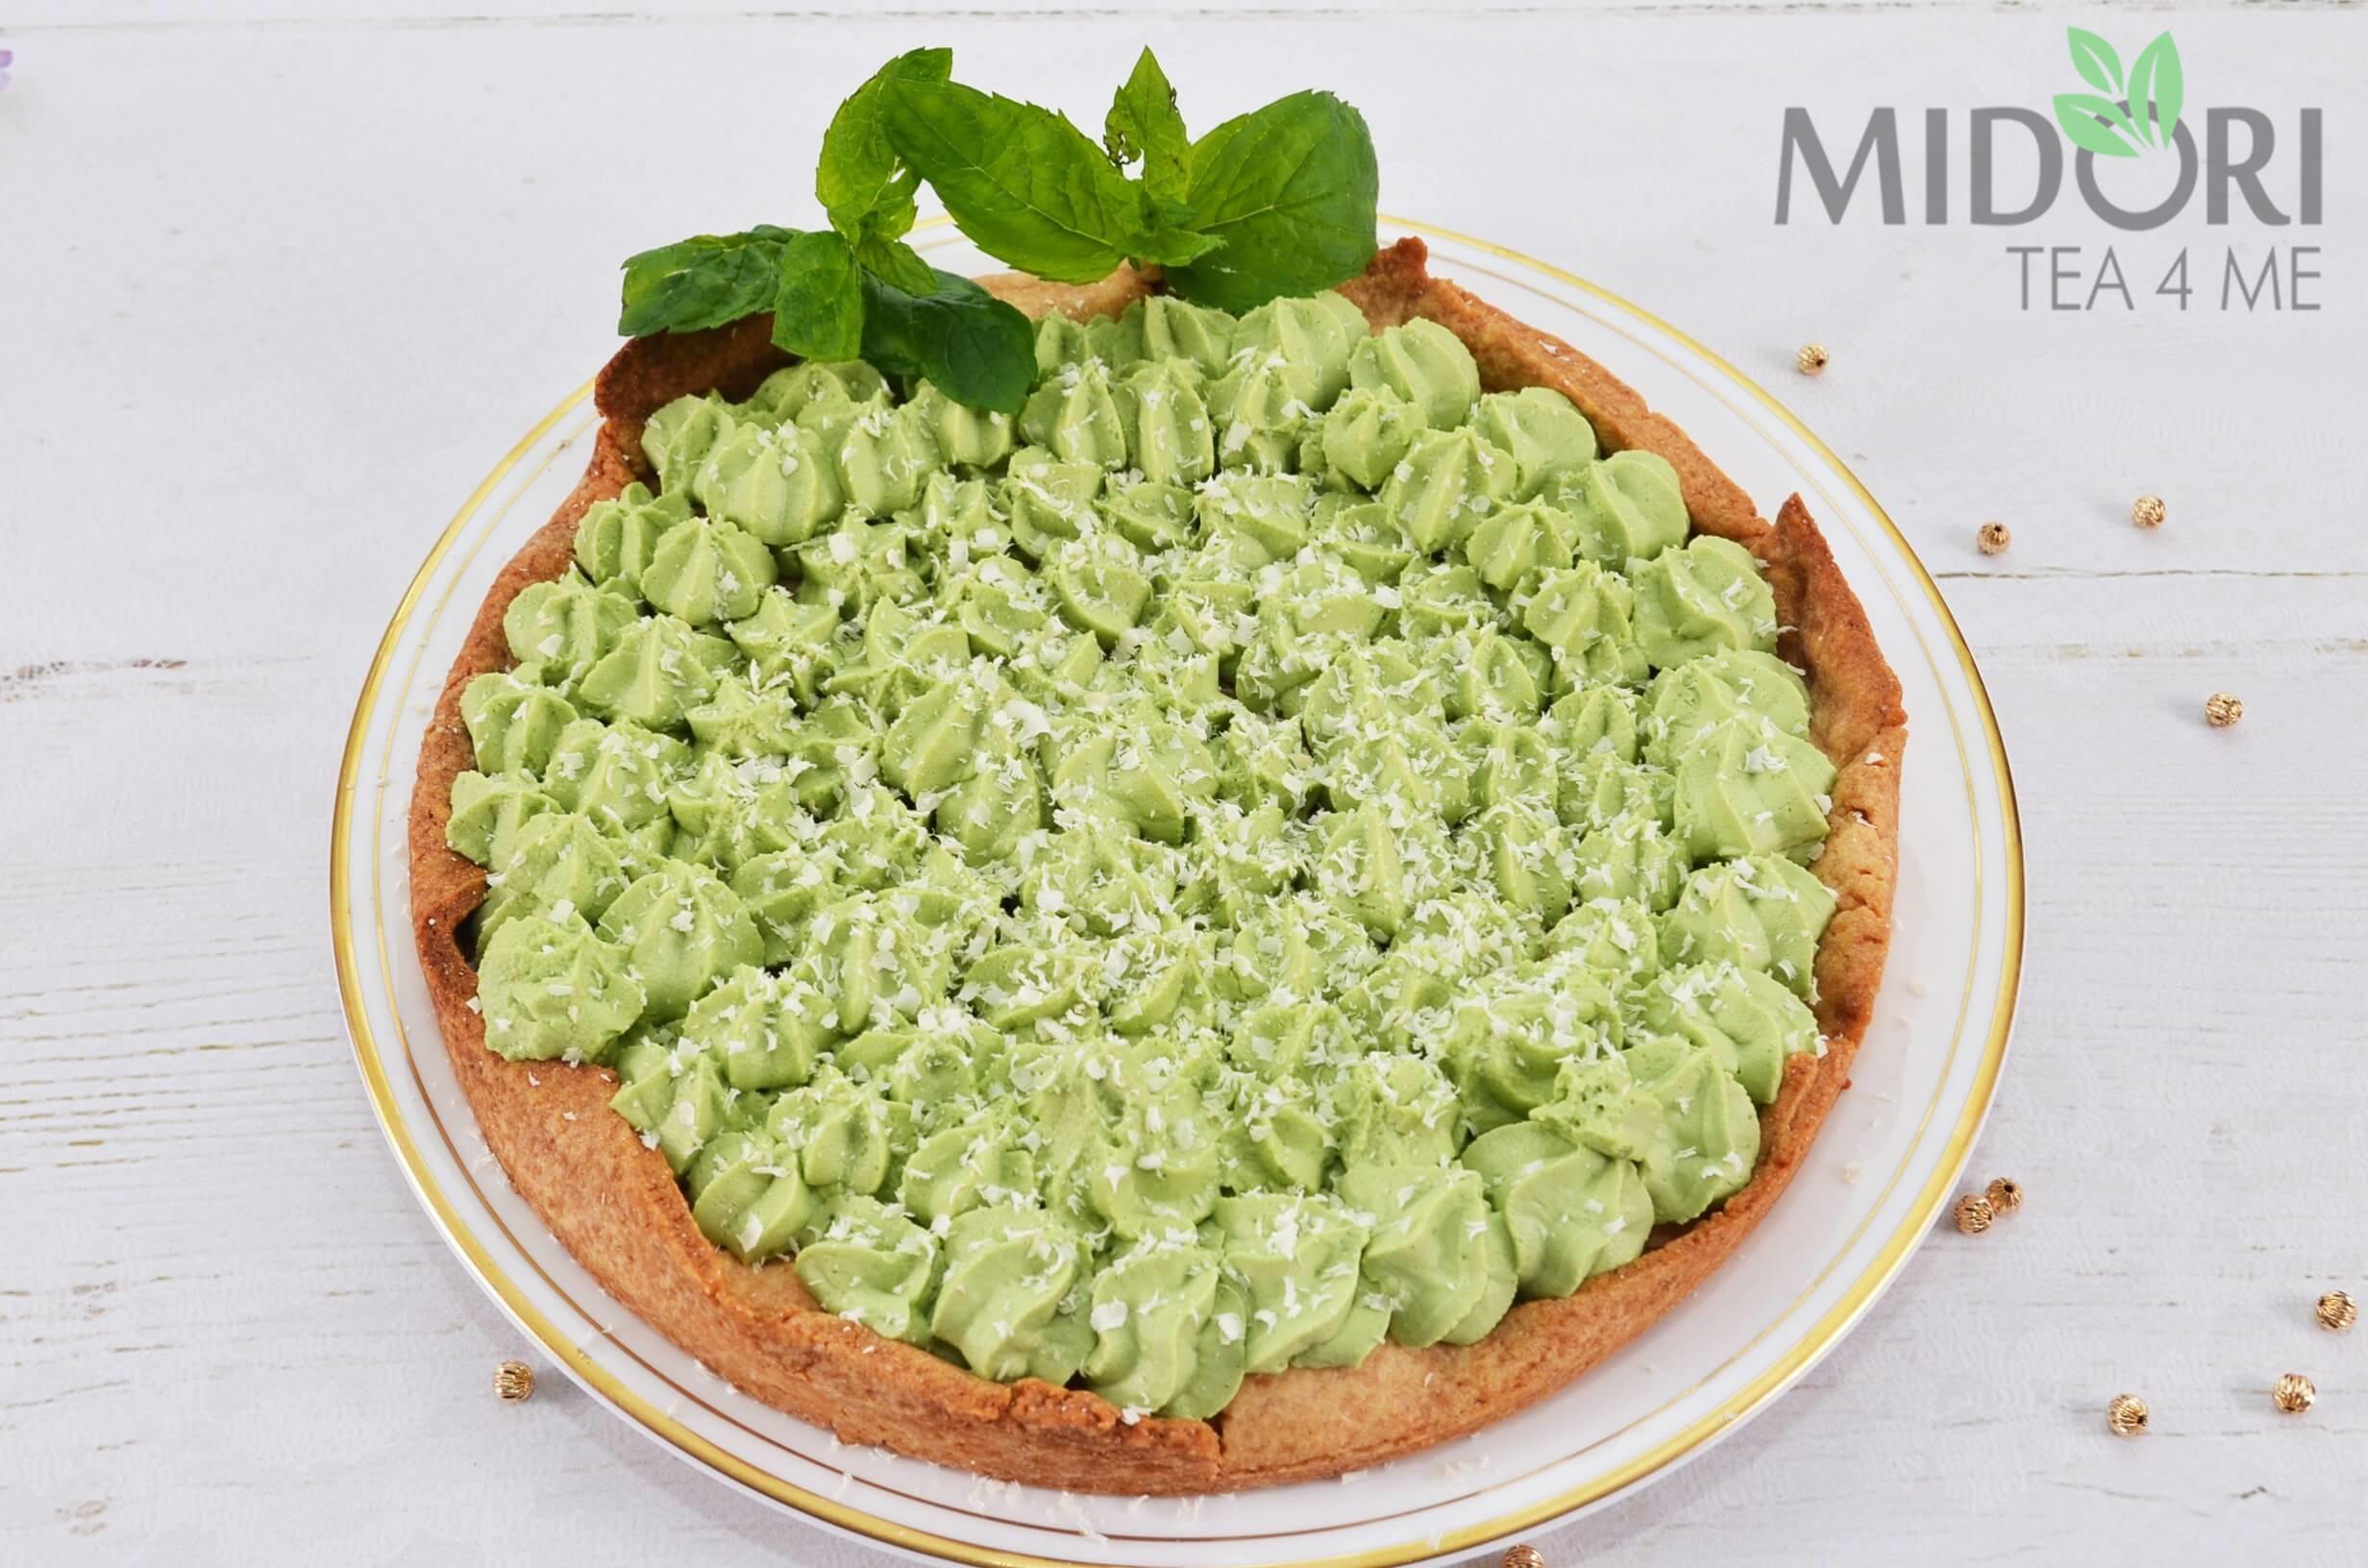 mazurek z zieloną herbatą, mazurek matcha, mazurek przepis, mazurek wielkanocny, wielkanocny mazurek